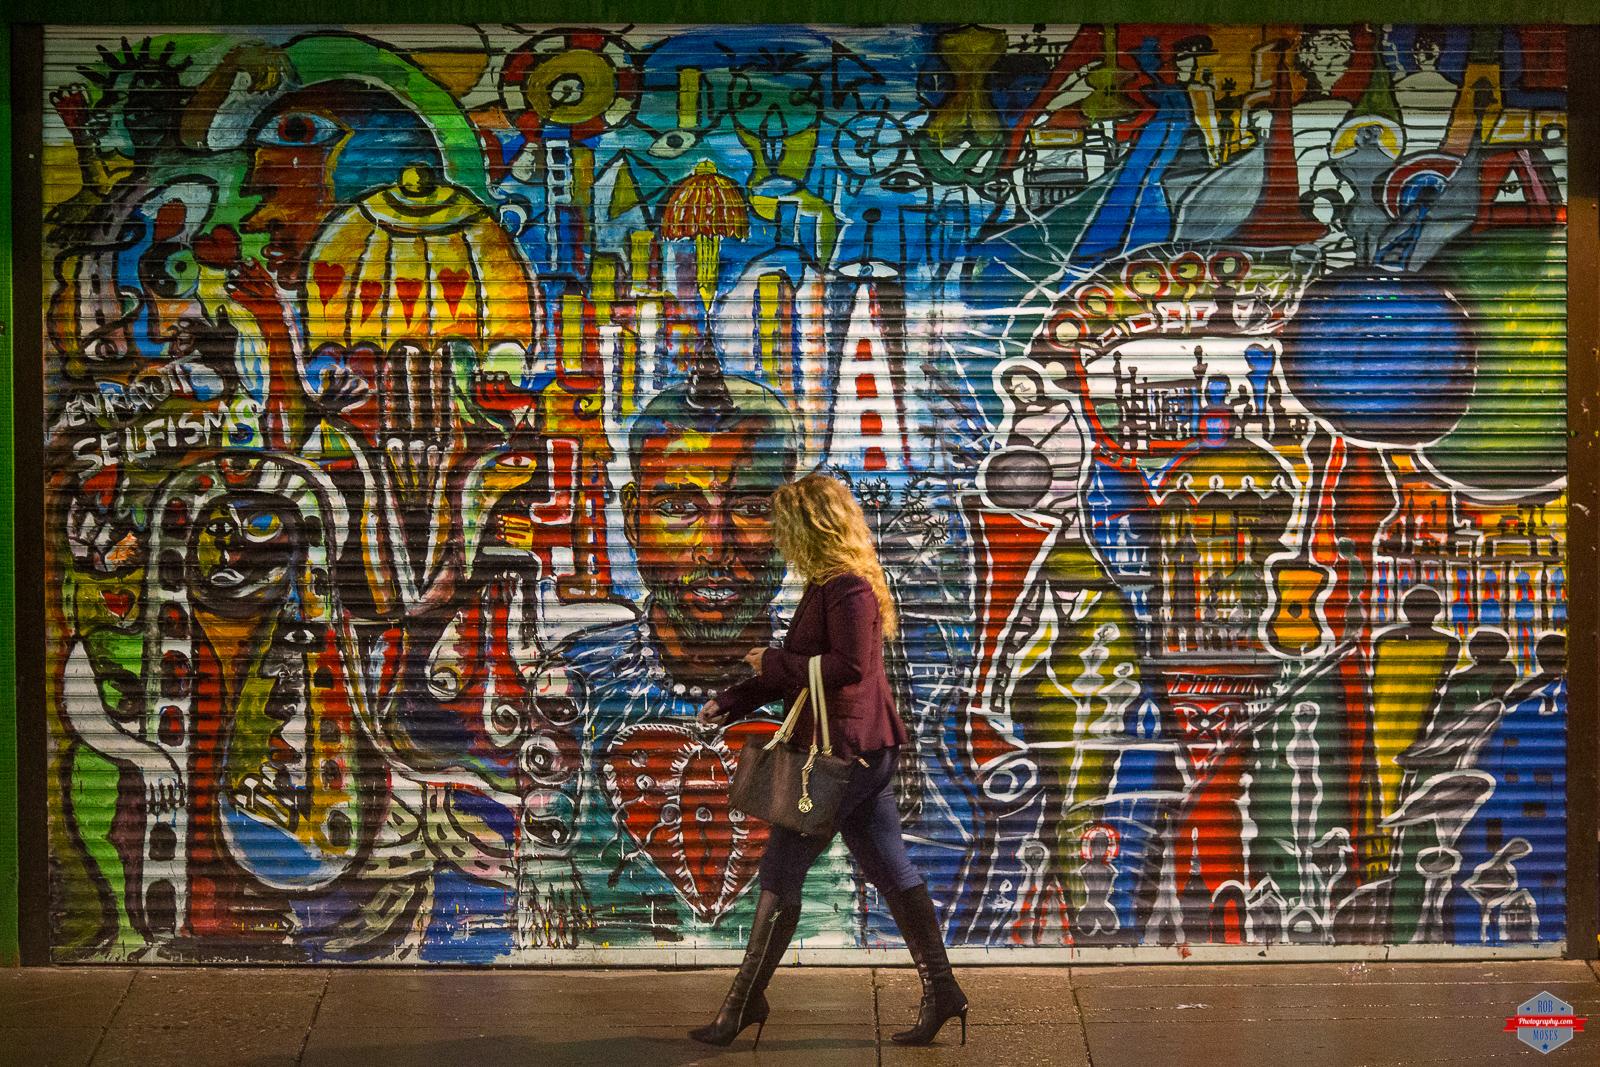 Graffiti wall calgary - Woman Girl Street Art Yyc Urban Metro Downtown City Rob Moses Photography Portland Calgary Vancouver Seattle